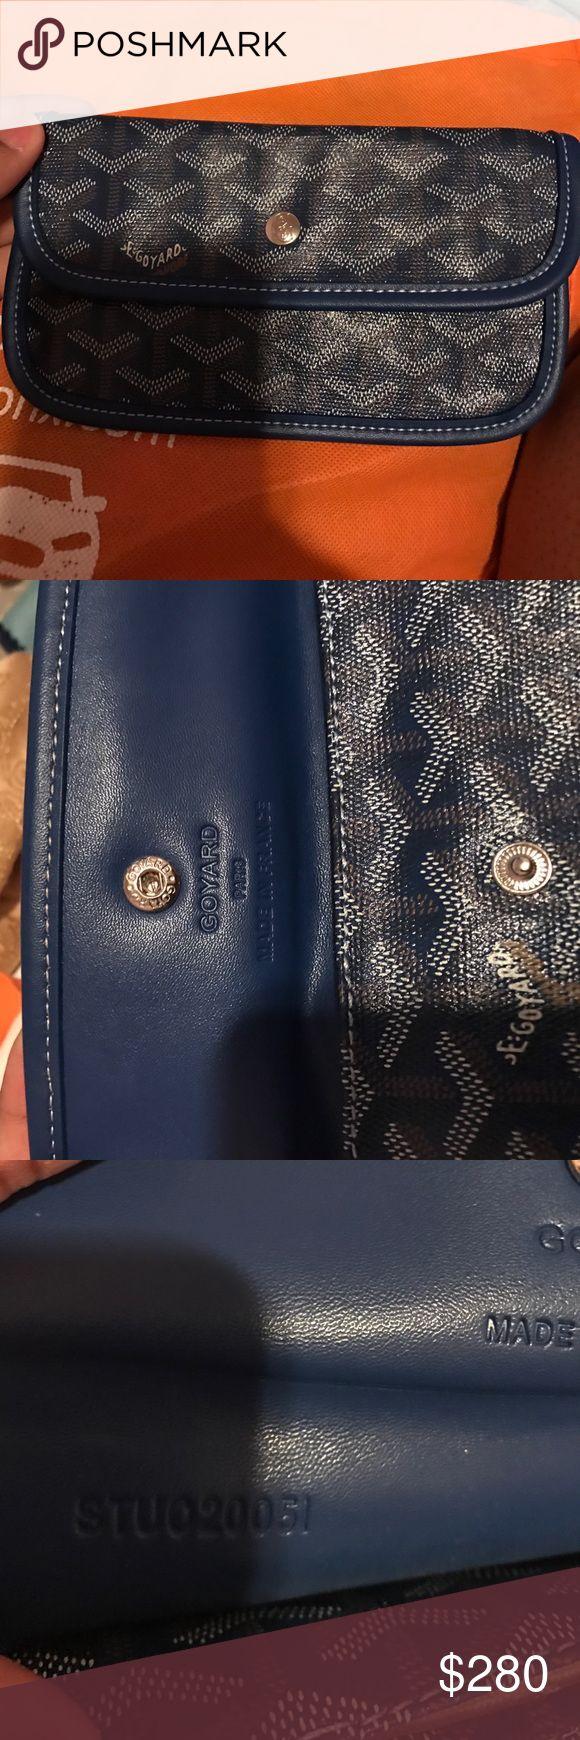 Goyard wallet 😍😍😍😍 In like new condition 😍😍😍😍 Goyard Accessories